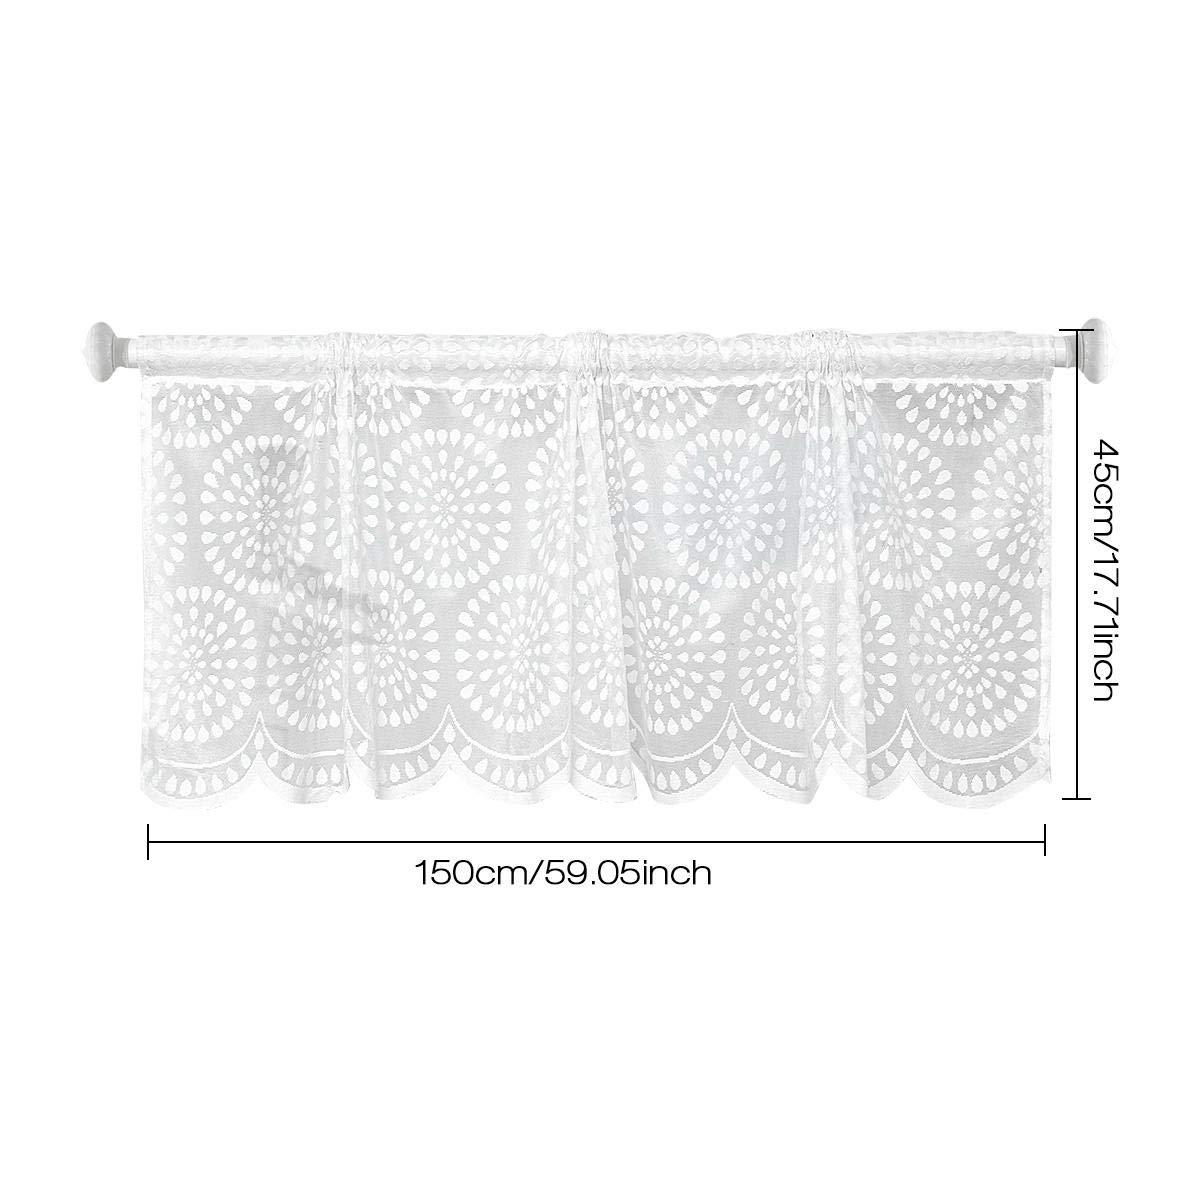 Pawaca Windows Valance Hollow Blackout Polyester Net Short Curtain For Kitchen Living Dining Room Windows Bathroom Kids Girl Baby Nursery